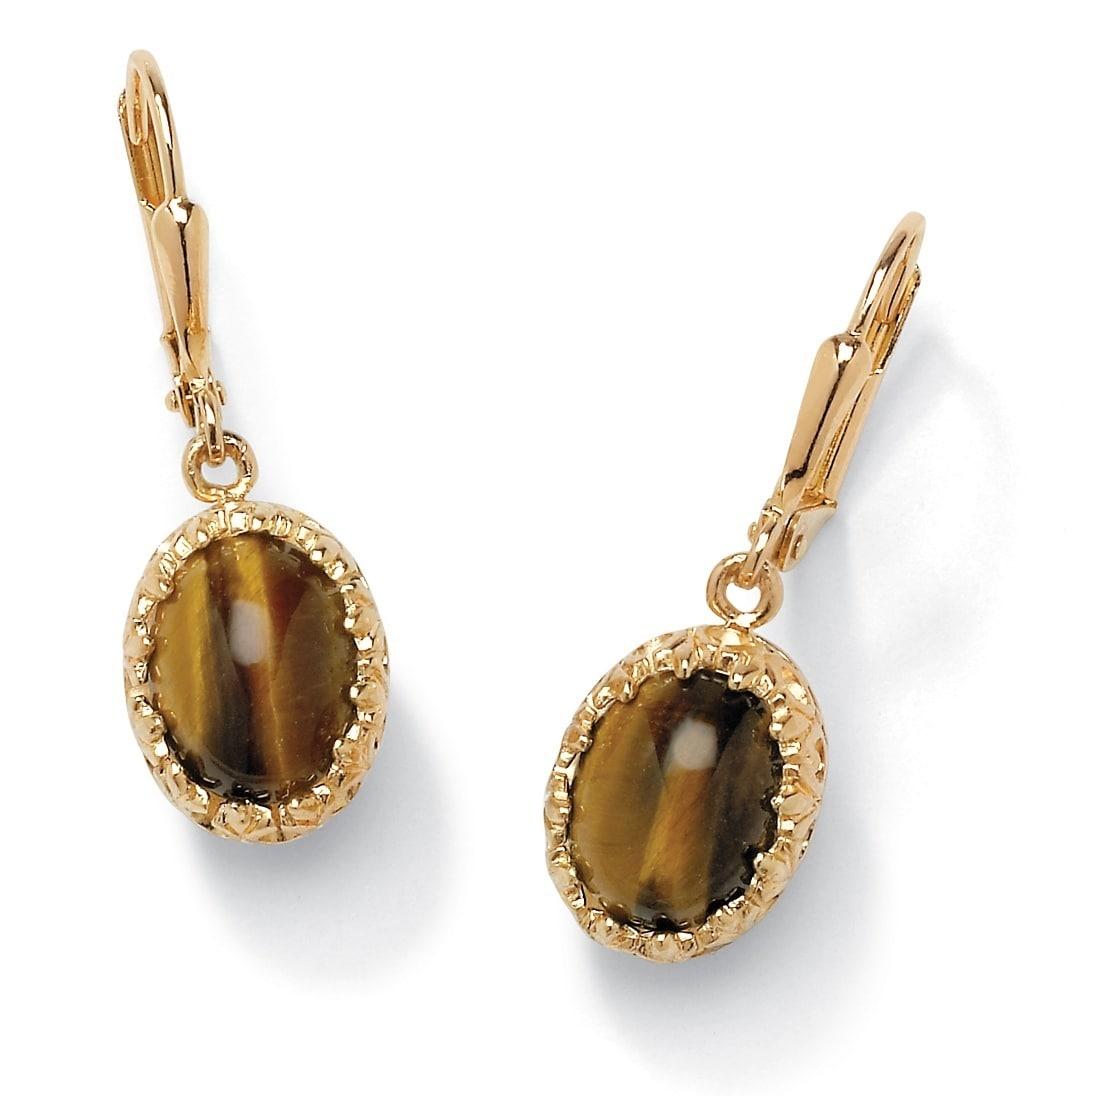 Yellow Genuine Tigers Eye Oval Stud Earrings for Woman